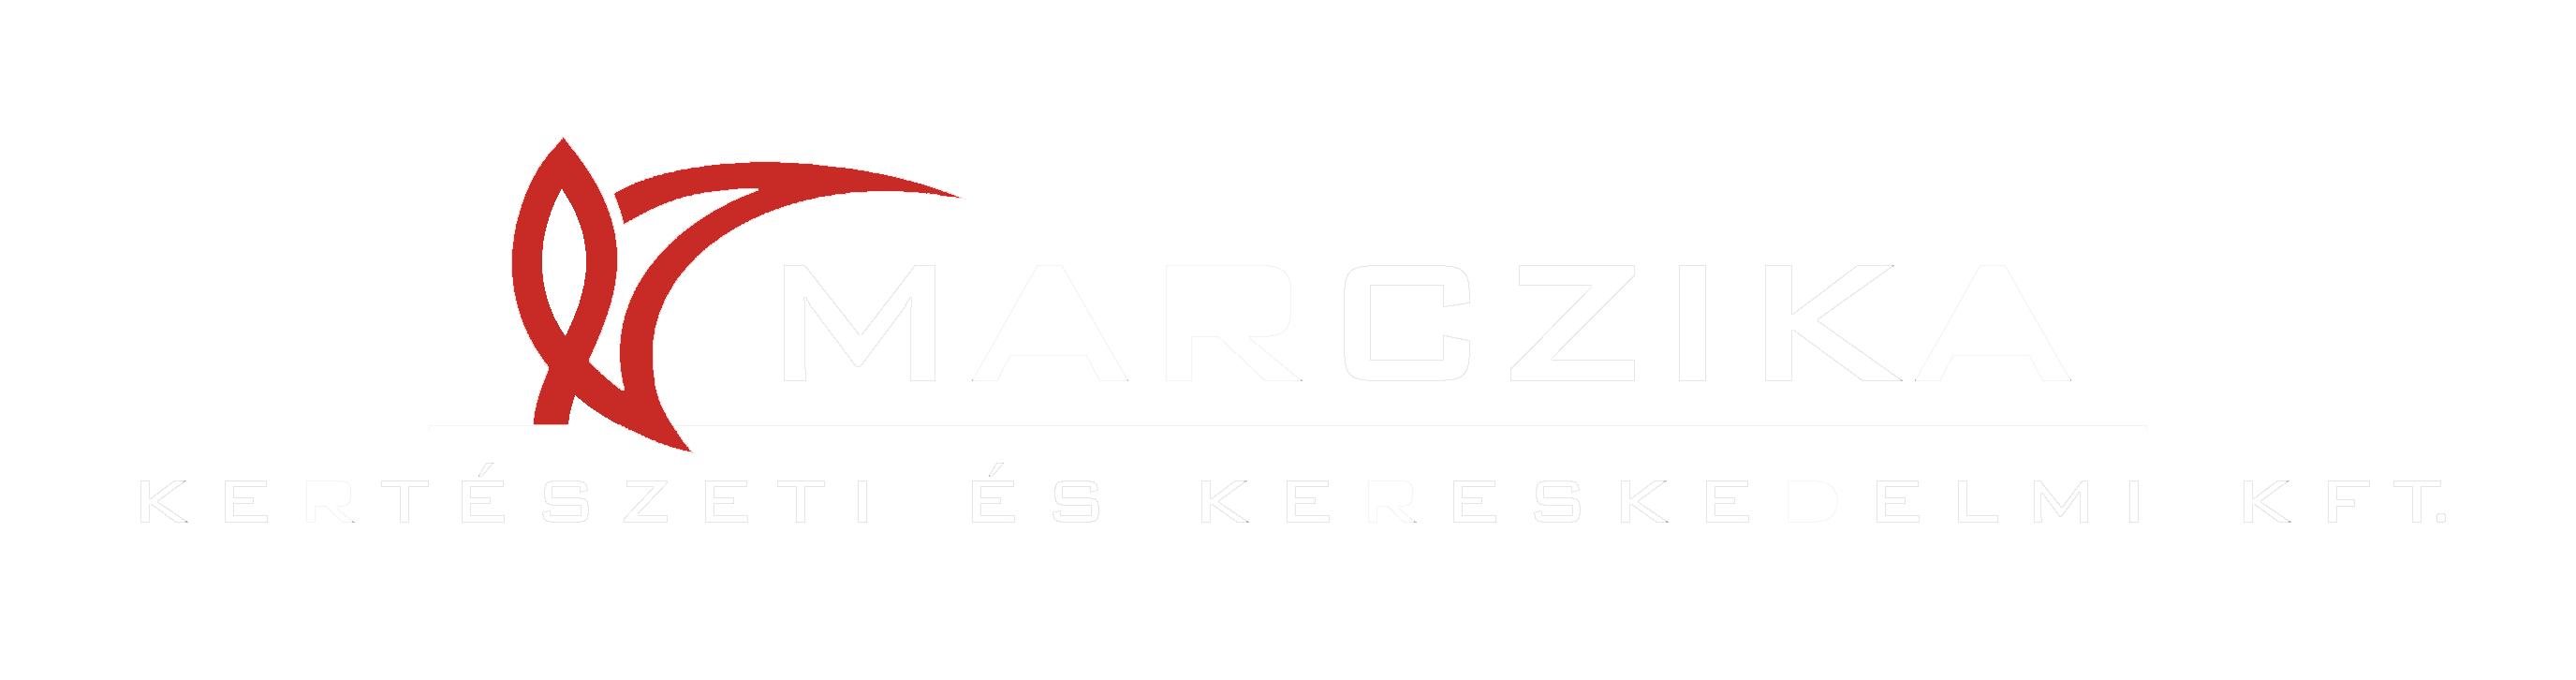 Marczika Kft.